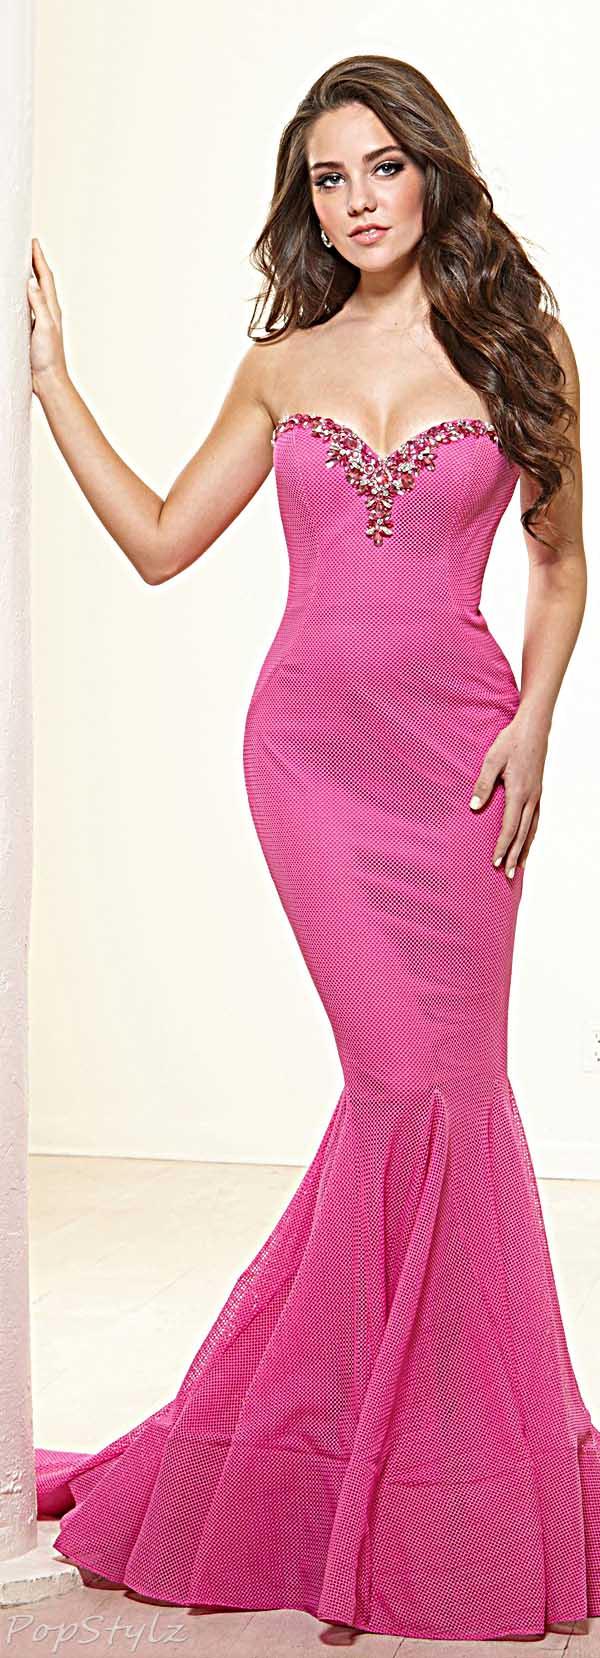 Terani Couture P3120 Dress